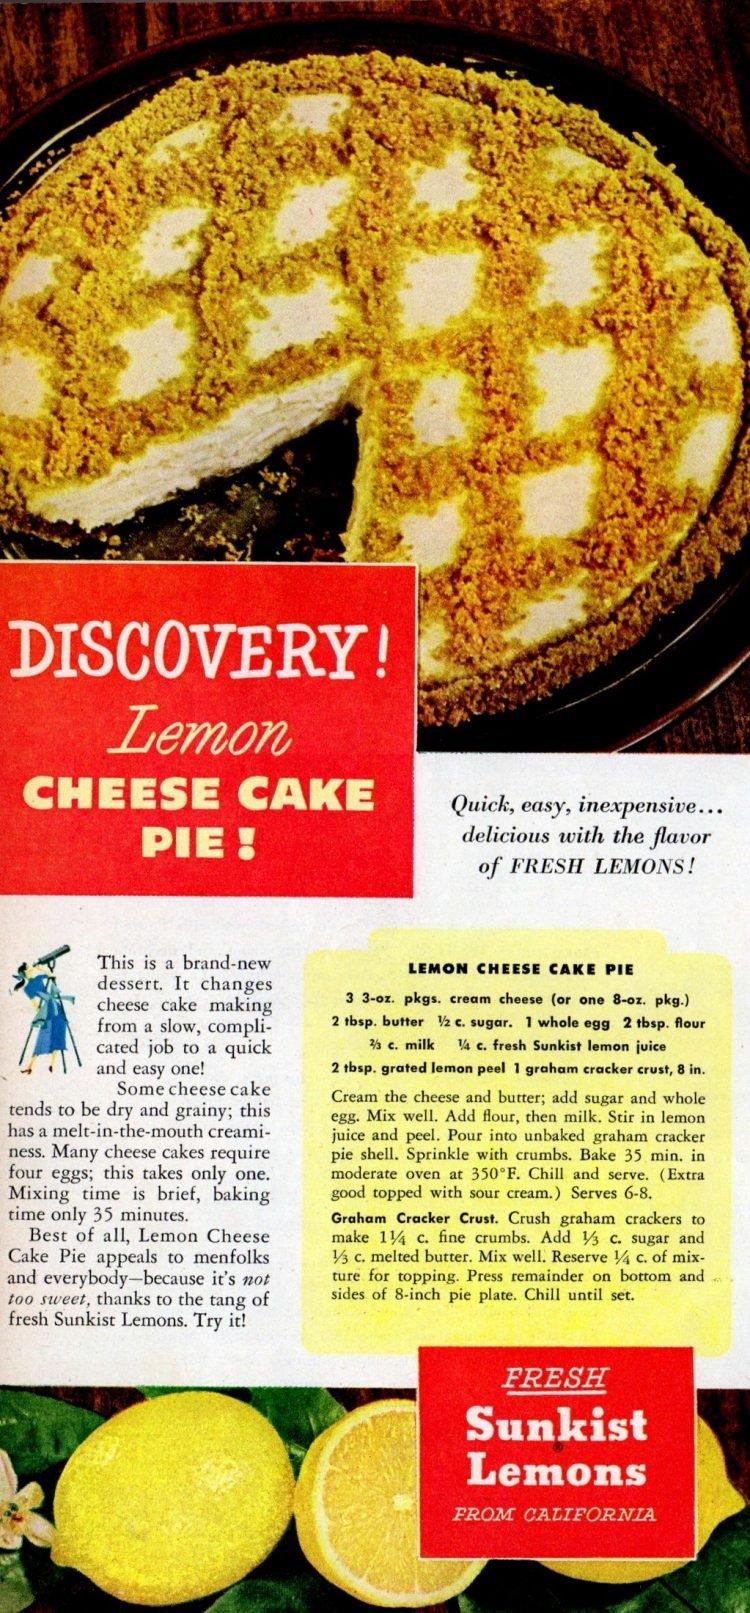 Easy lemon cheesecake pie - A retro recipe from the 1950s